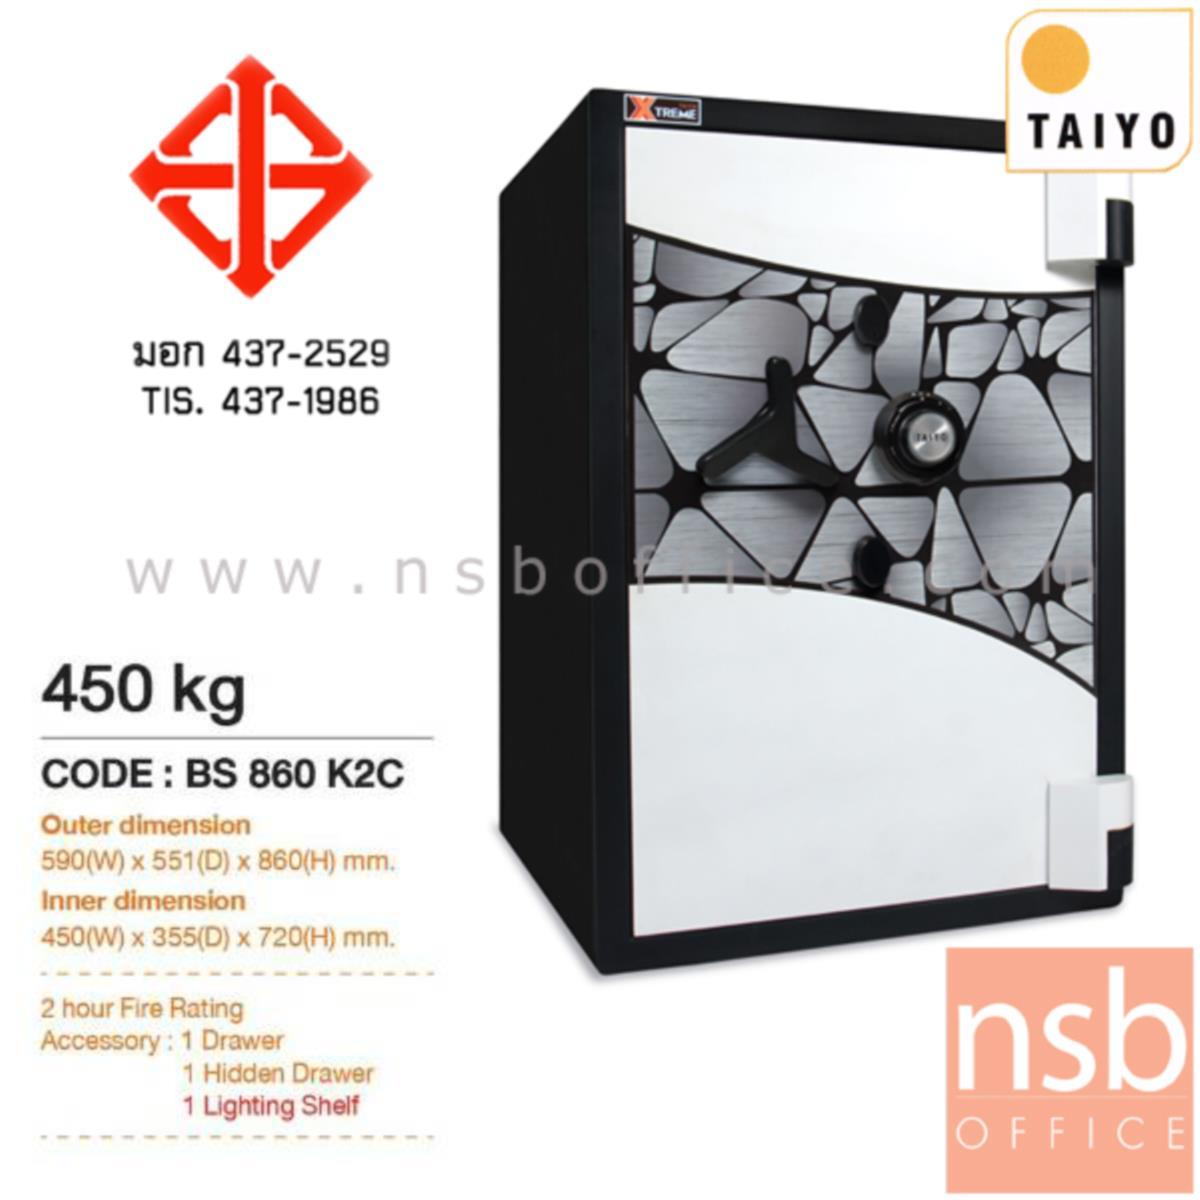 F01A065:Taiyo Xtreme รุ่นพิเศษ น้ำหนัก 450 กก. 2 กุญแจ 1 รหัส